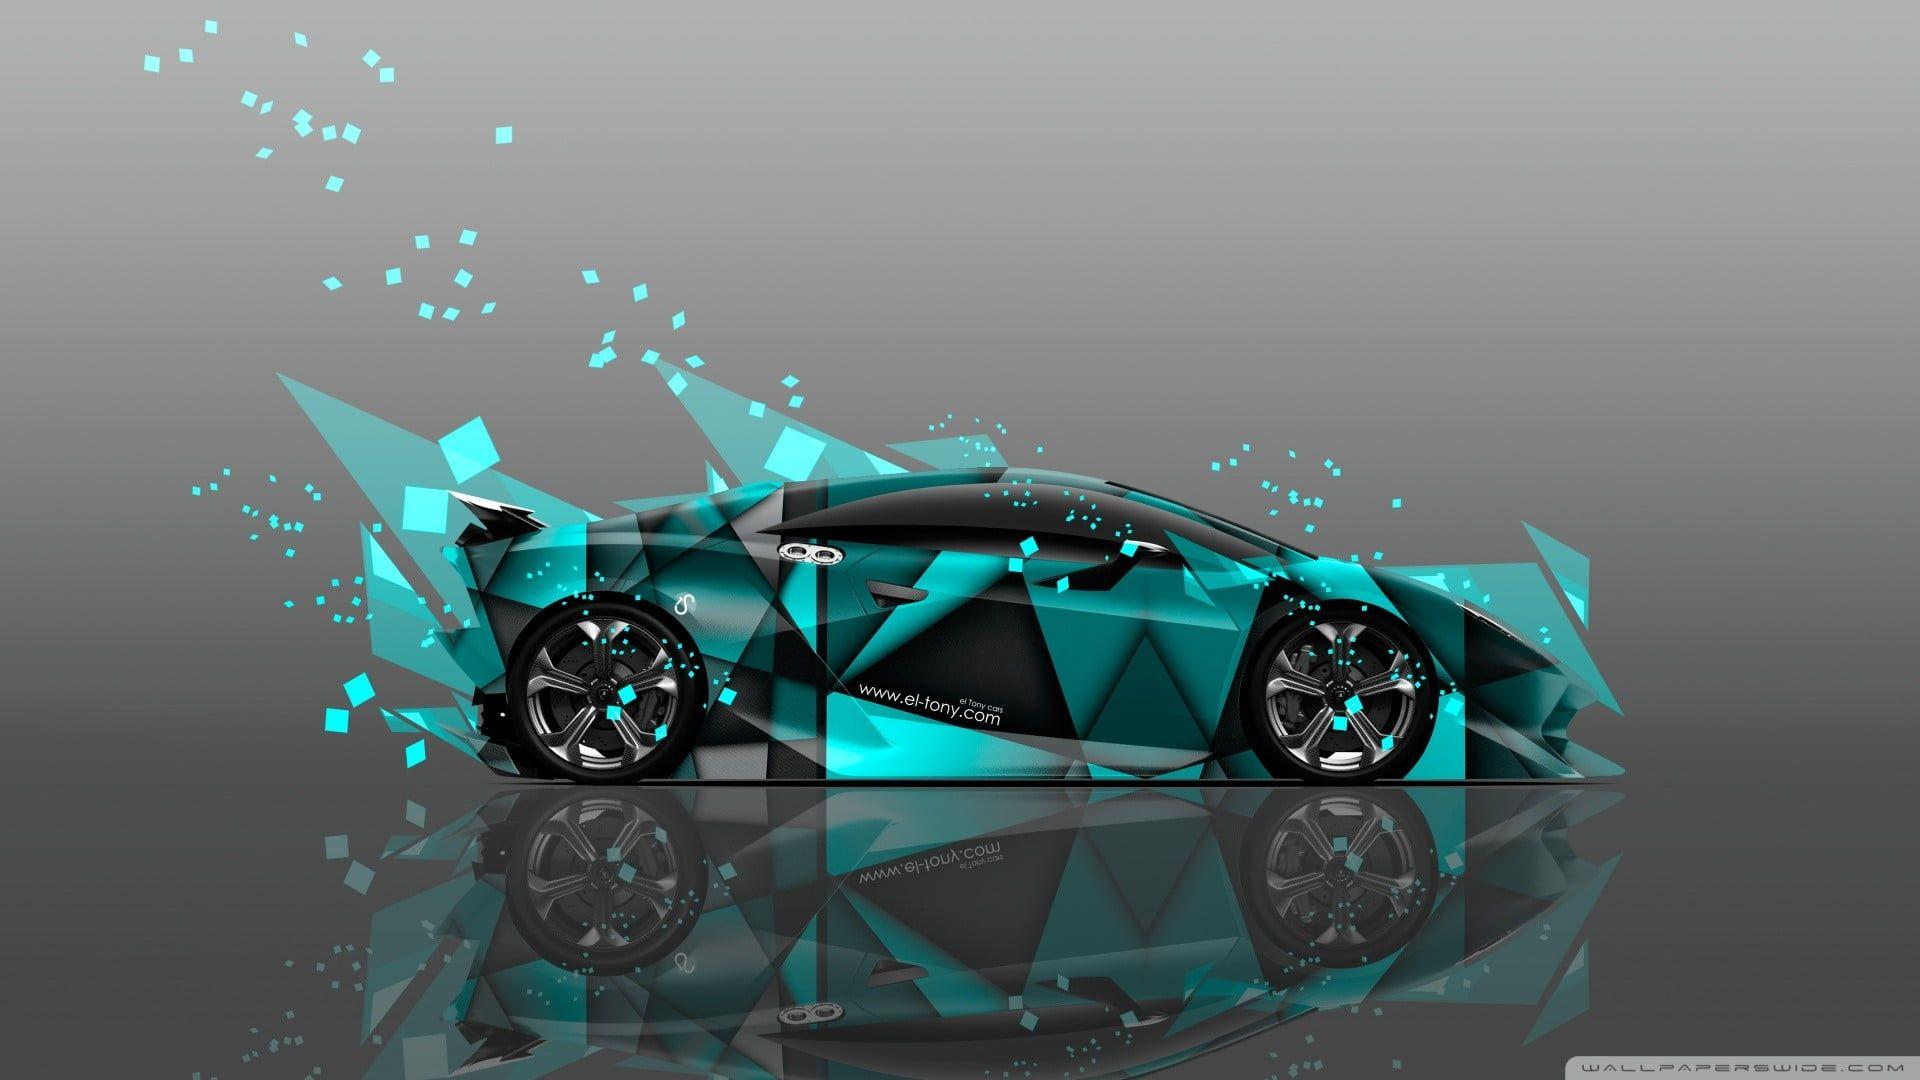 Teal Supercar Coupe Carros Car 1080p Wallpaper Hdwallpaper Desktop Uhd Wallpaper Hd Wallpaper Car Wallpapers